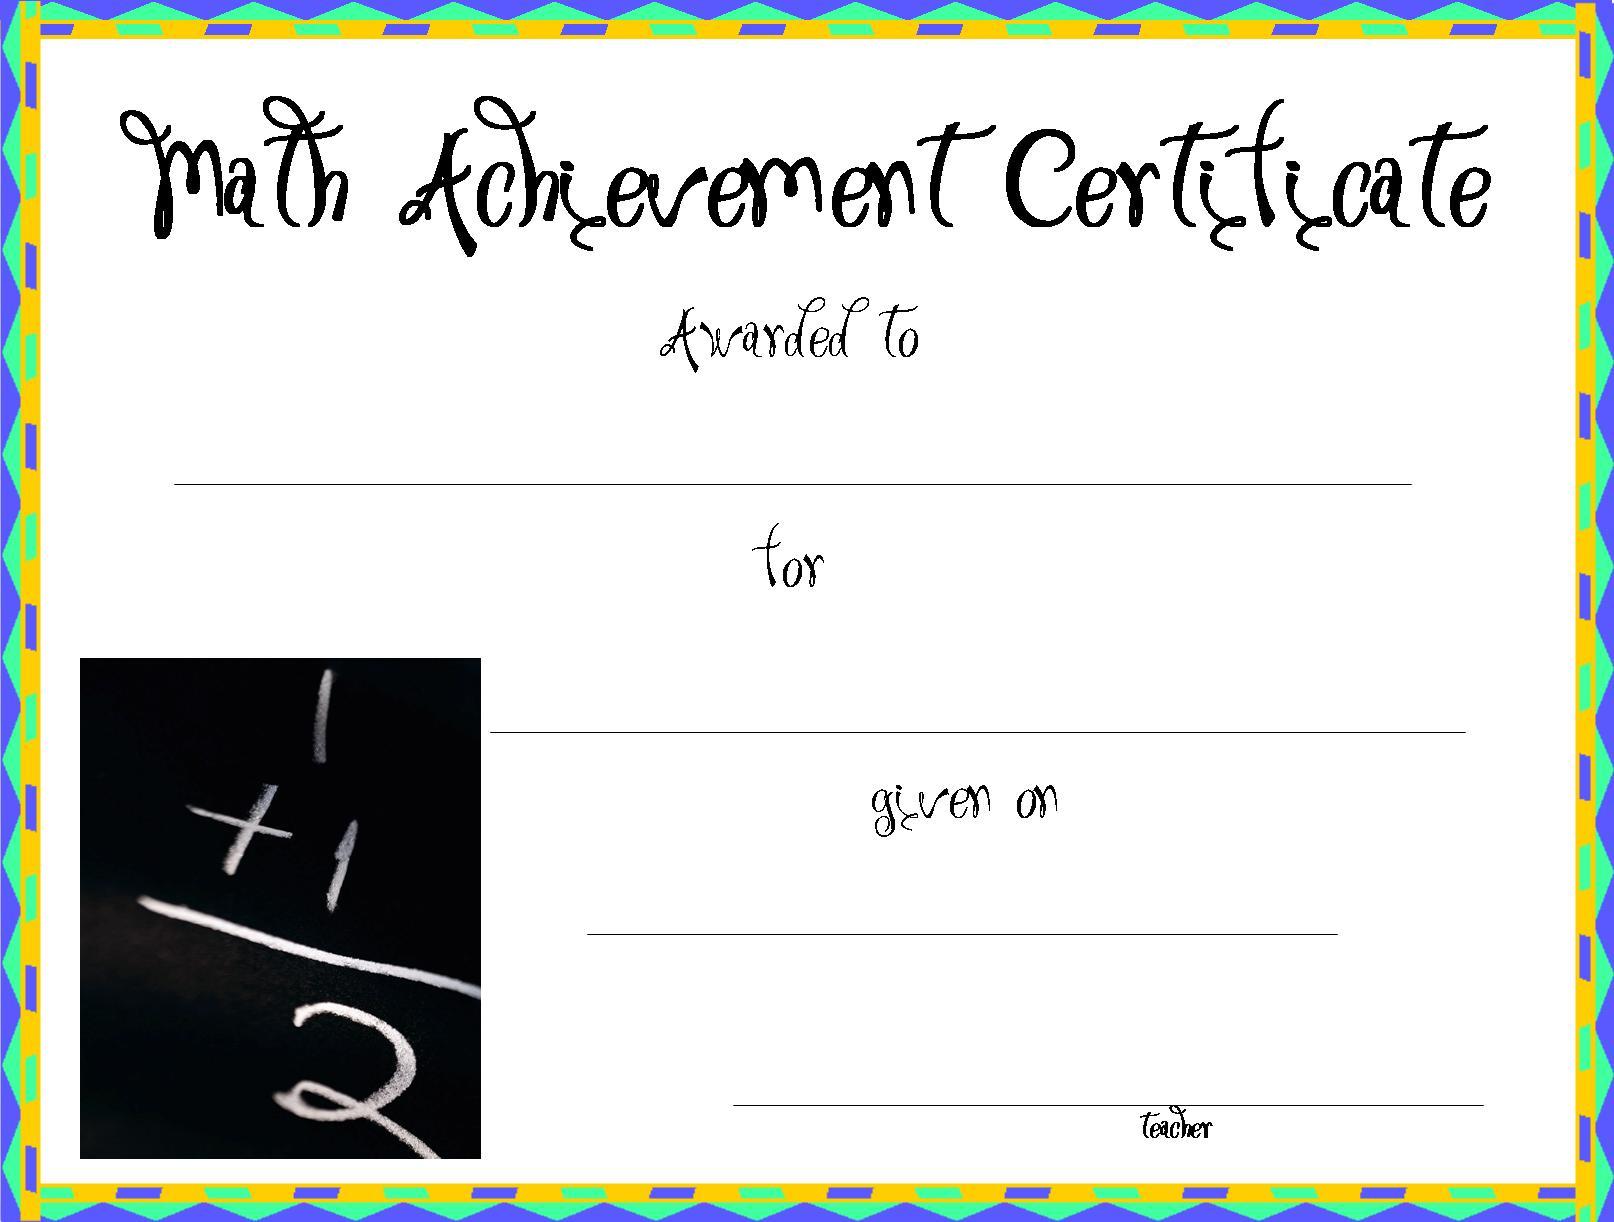 Printable math award redbulstandardinternational printable math award certificates yelopaper Choice Image